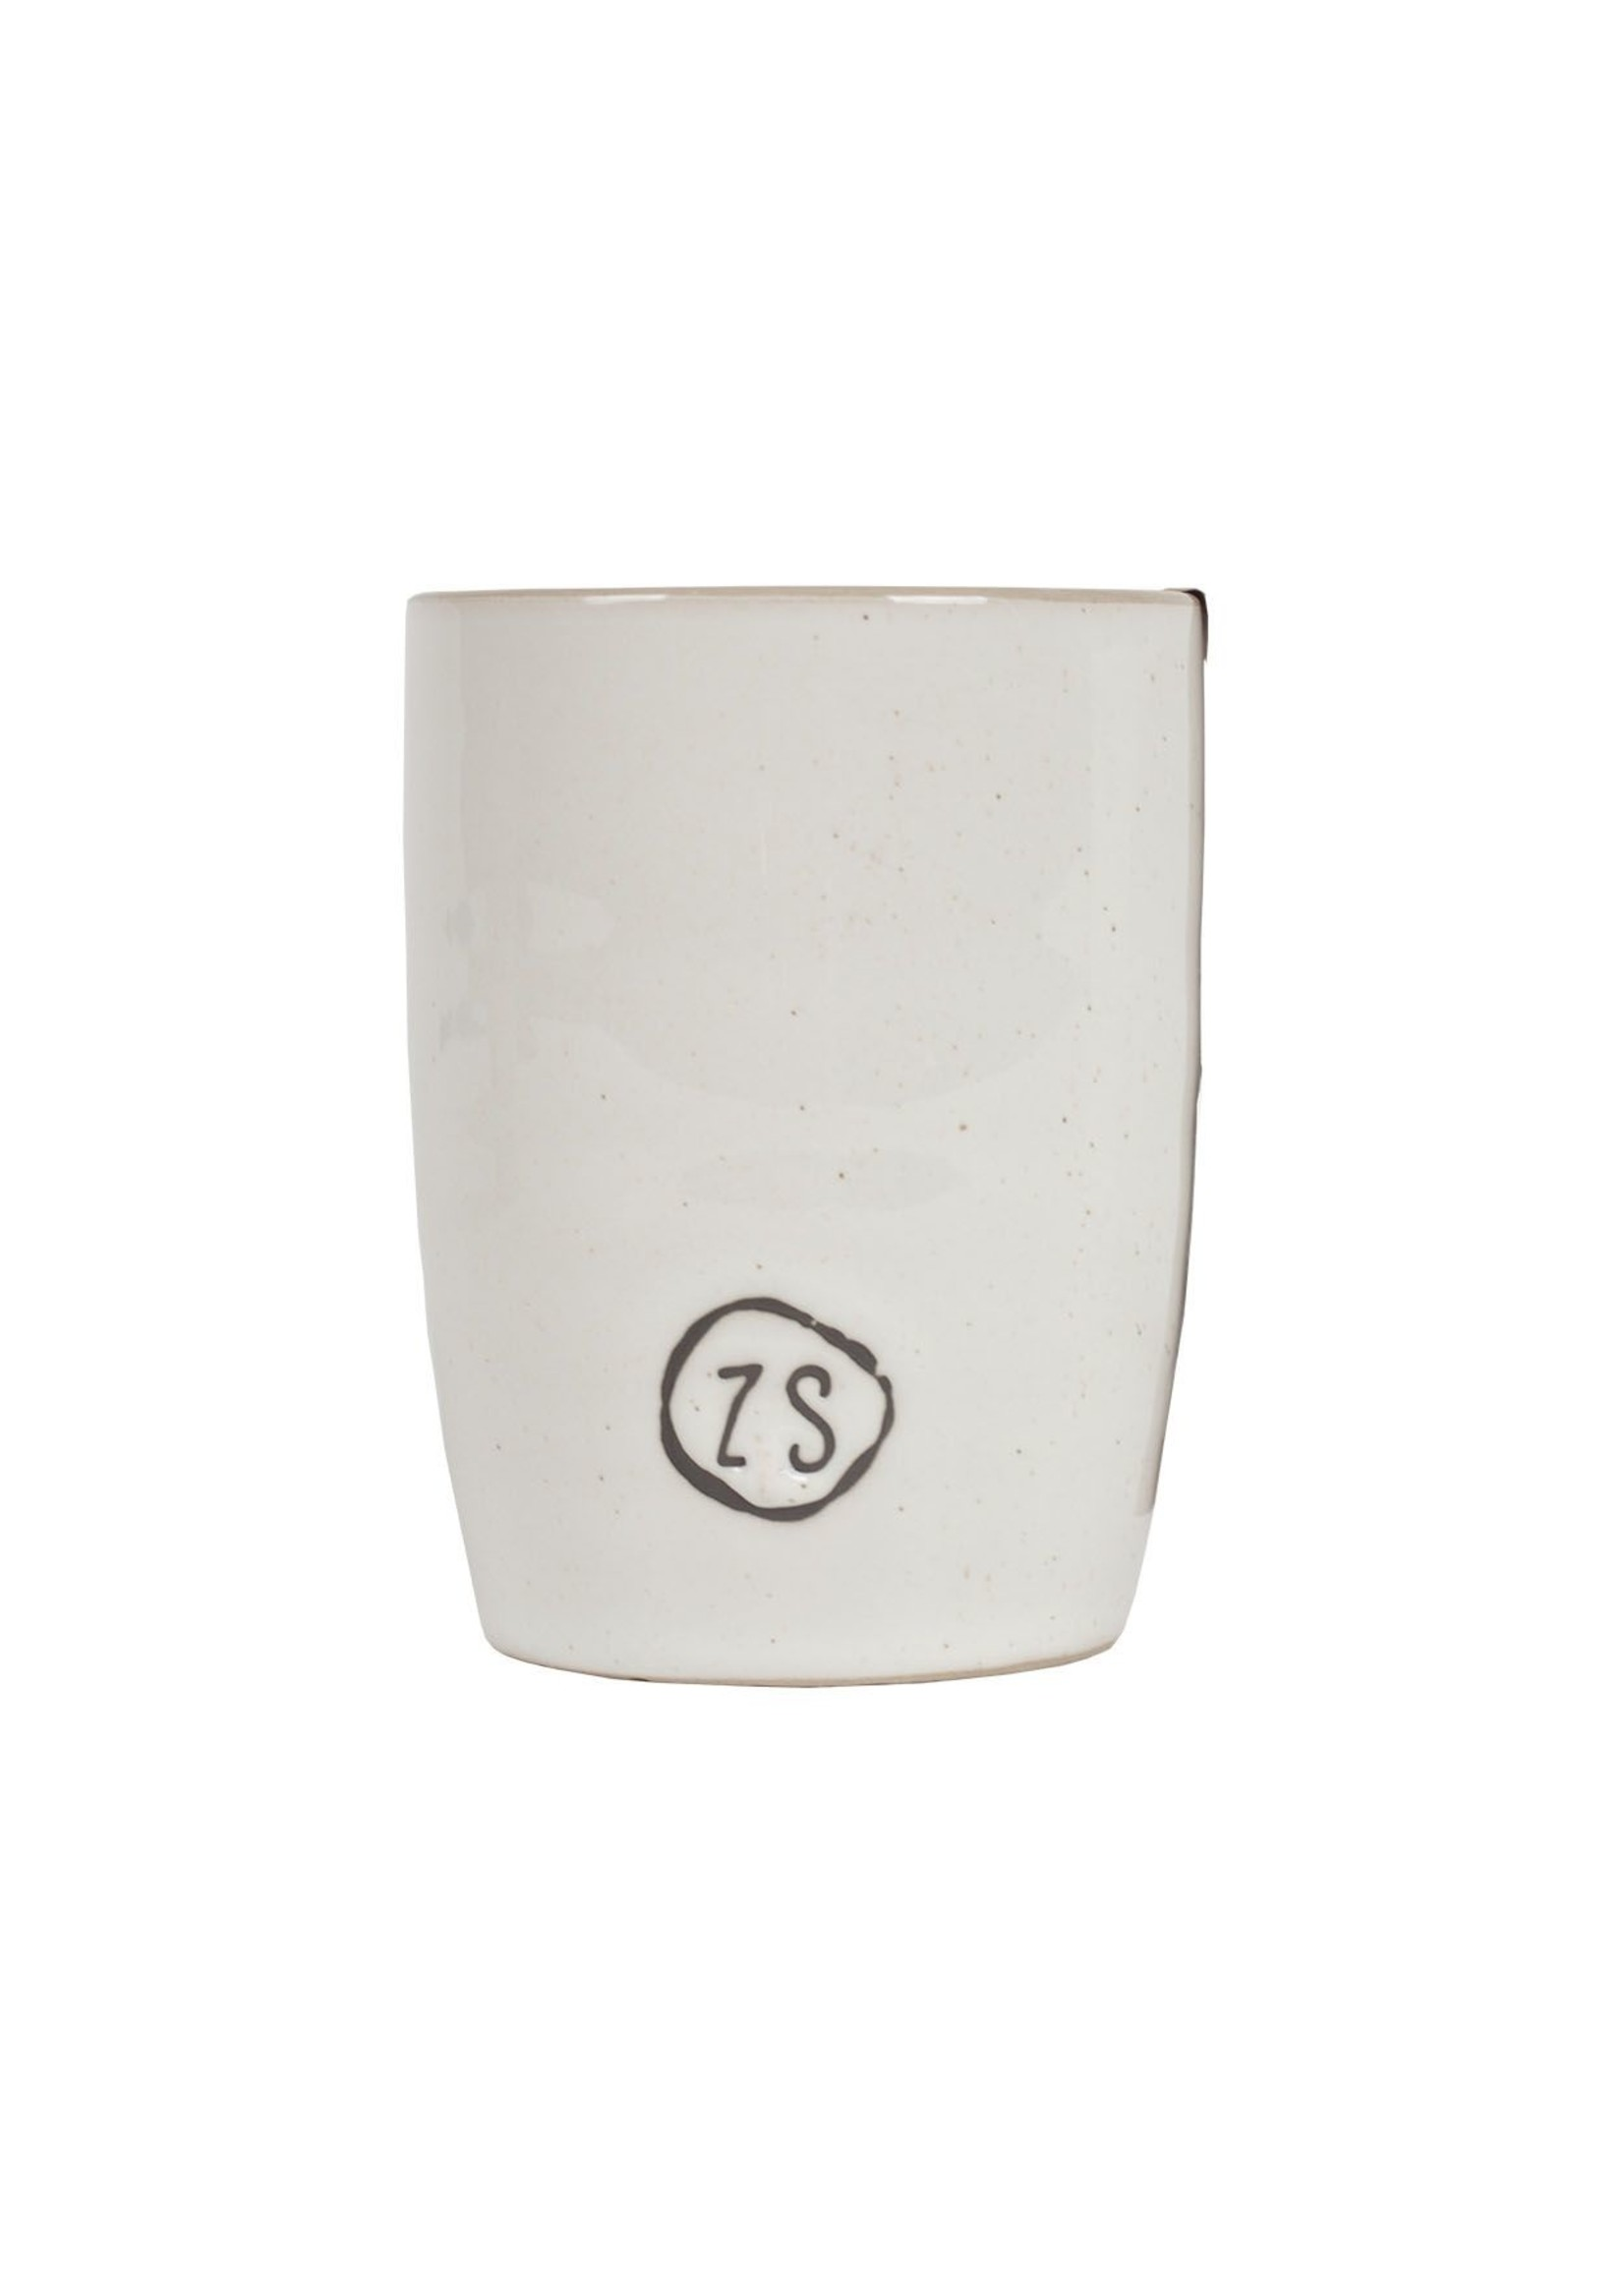 ZUSSS koffiemok aardewerk wit